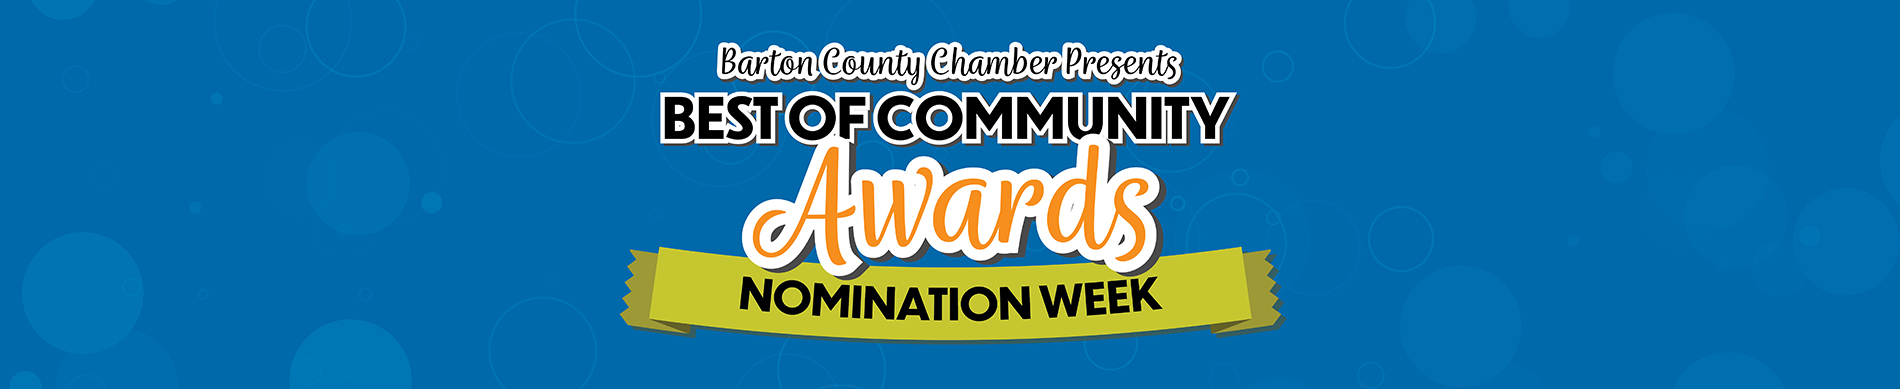 Best Of Community Awards Nomination Week